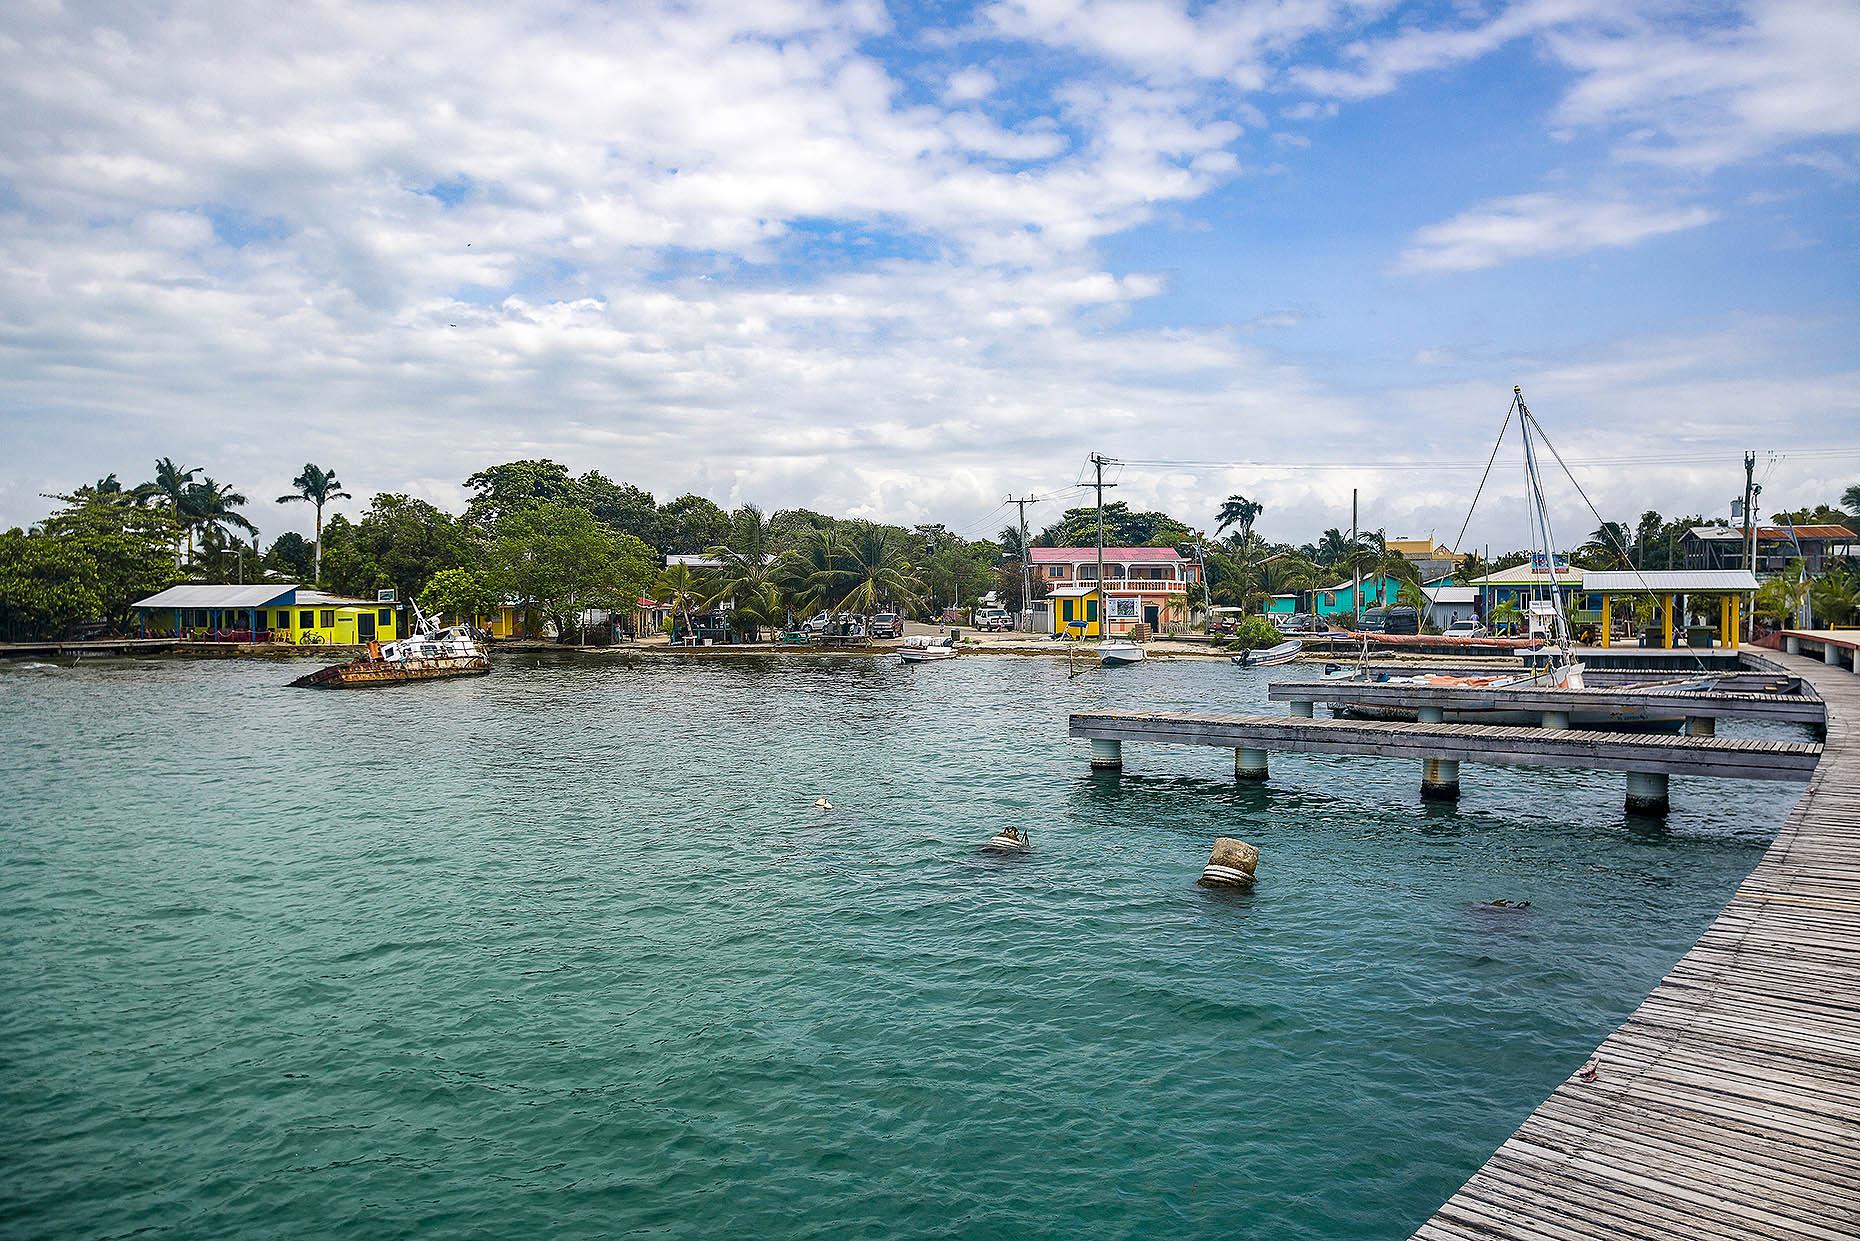 Belize_Placencia_Harbor_01.jpg